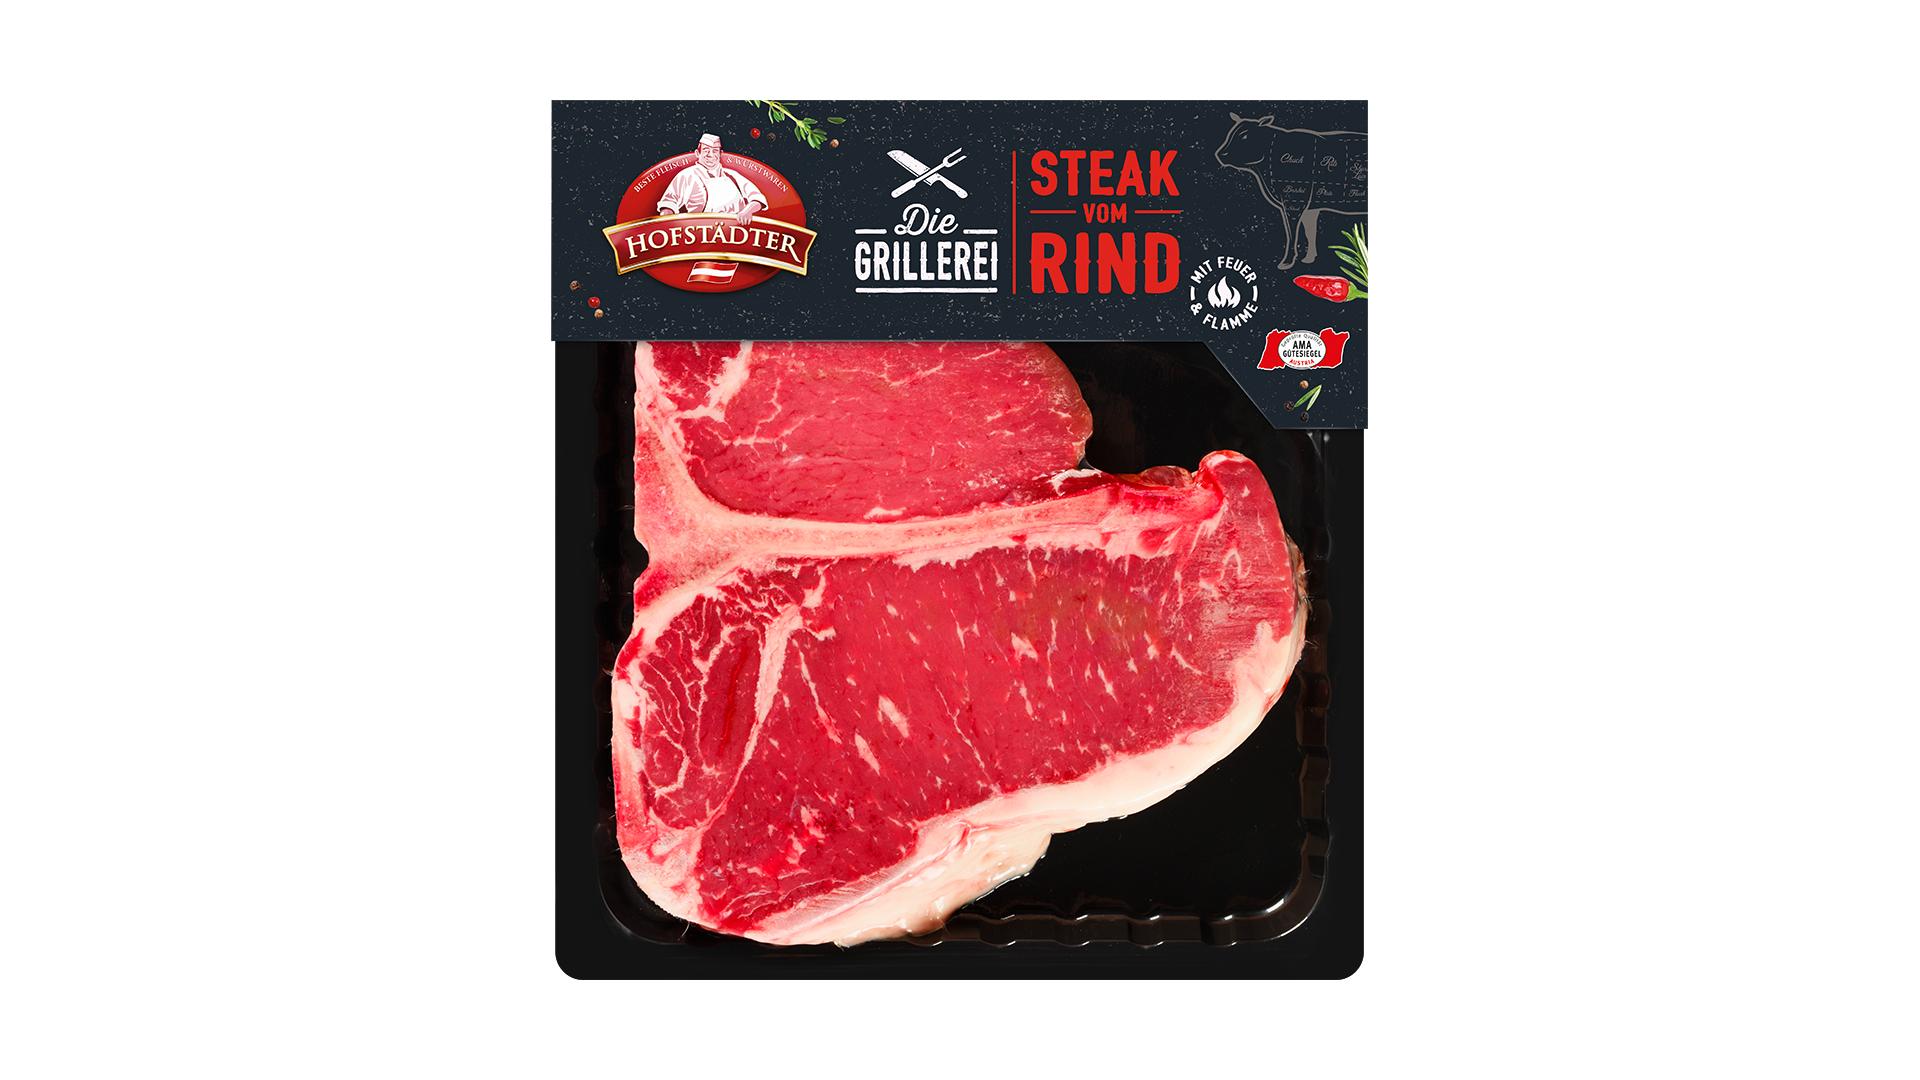 Hofstädter T-Bone Steak